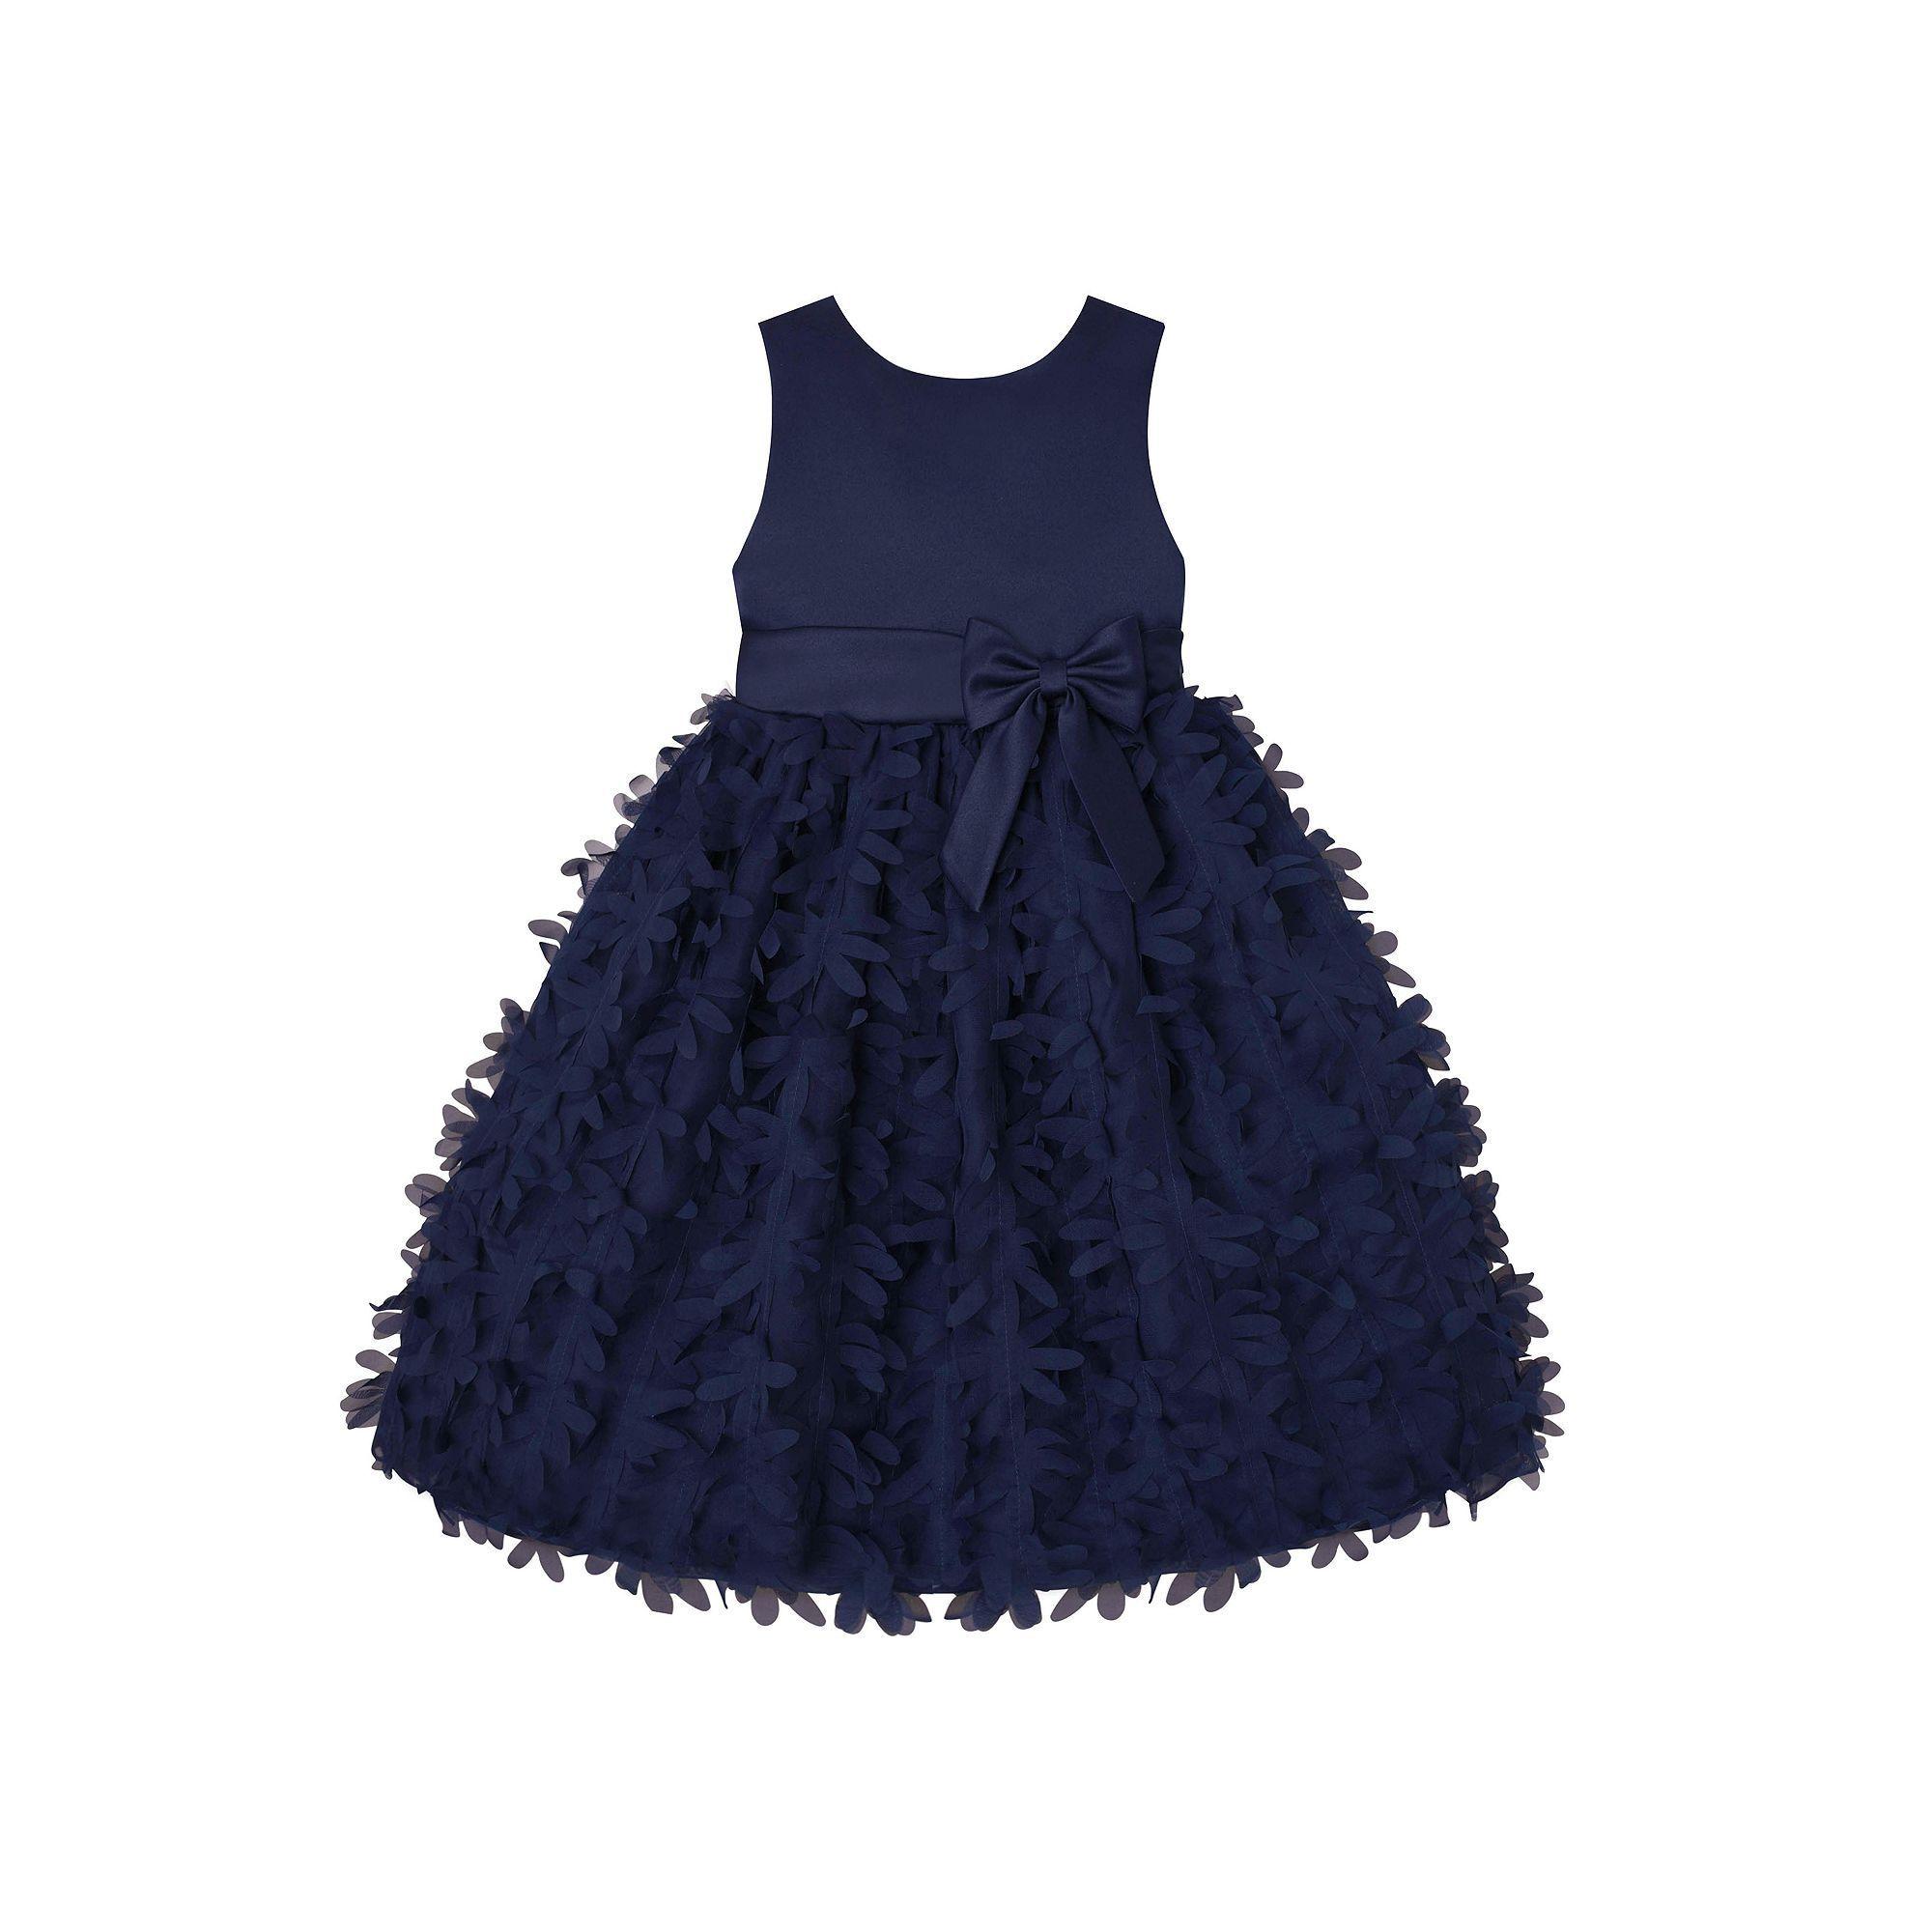 ea713502a0158 Girls 7-16   Plus Size American Princess Petal Applique Dress ...